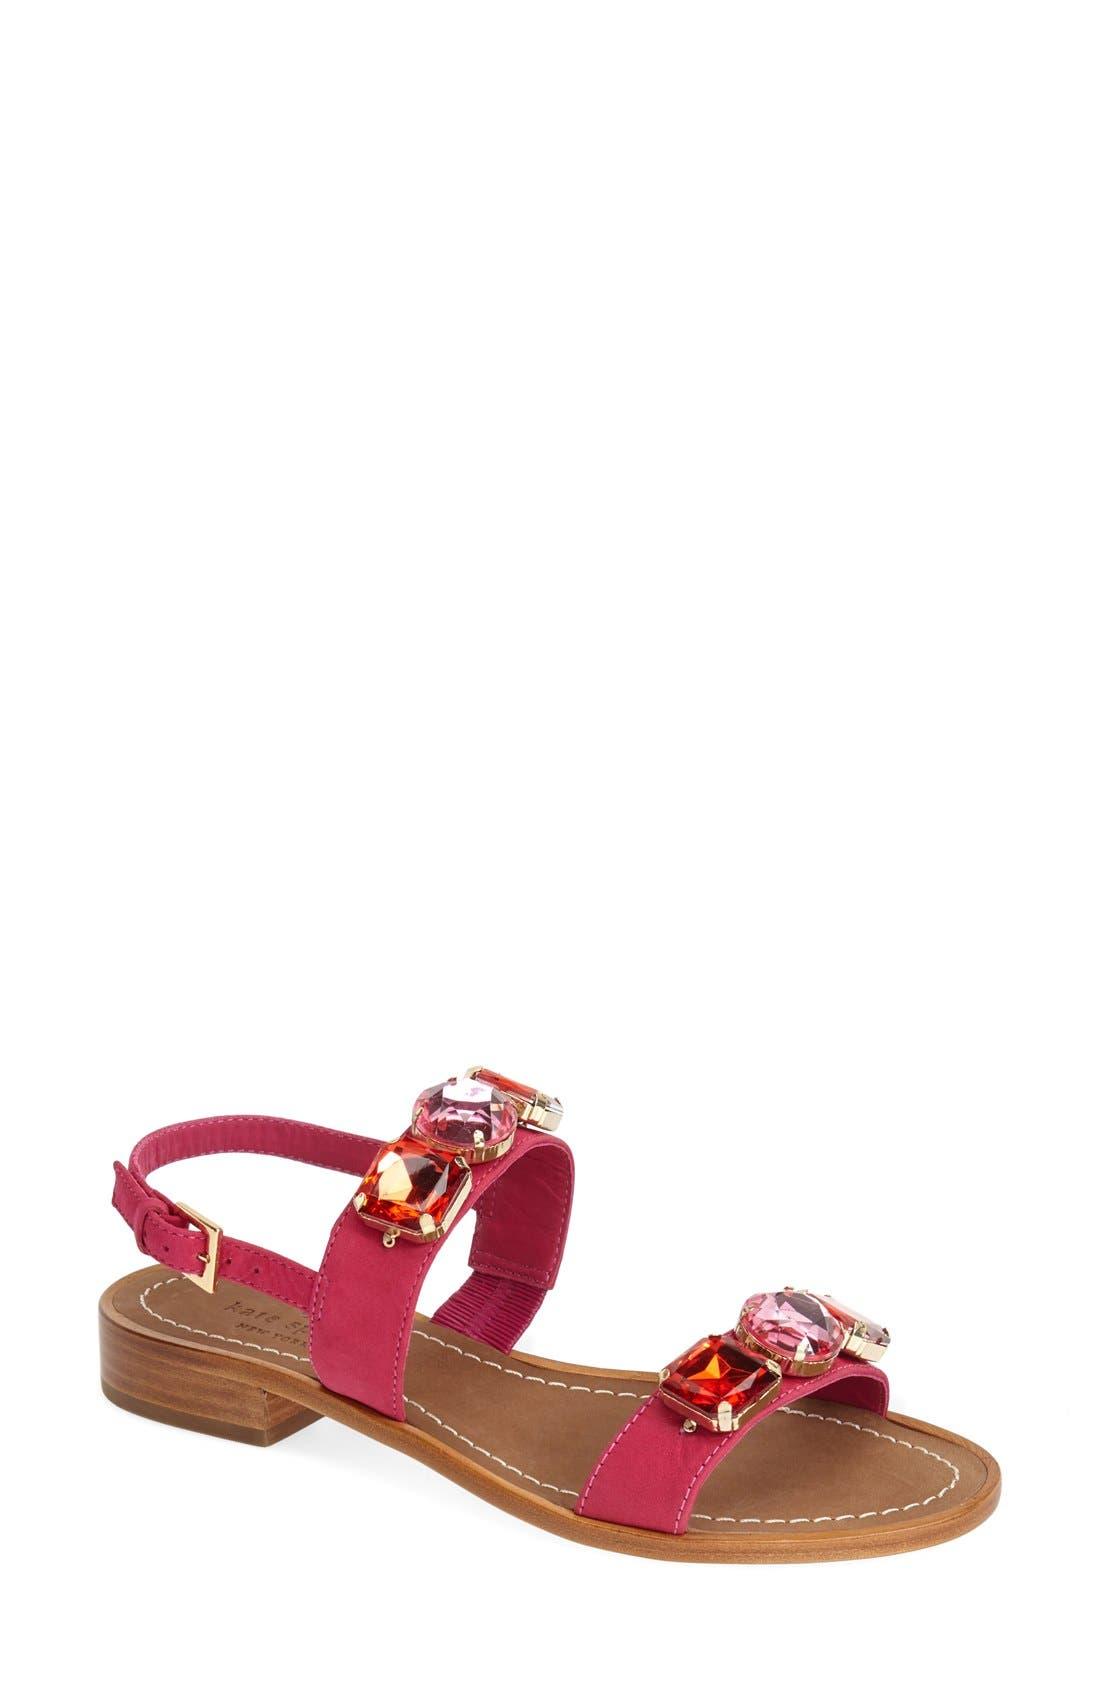 Main Image - kate spade new york 'bacau' ornate double band sandal (Women)